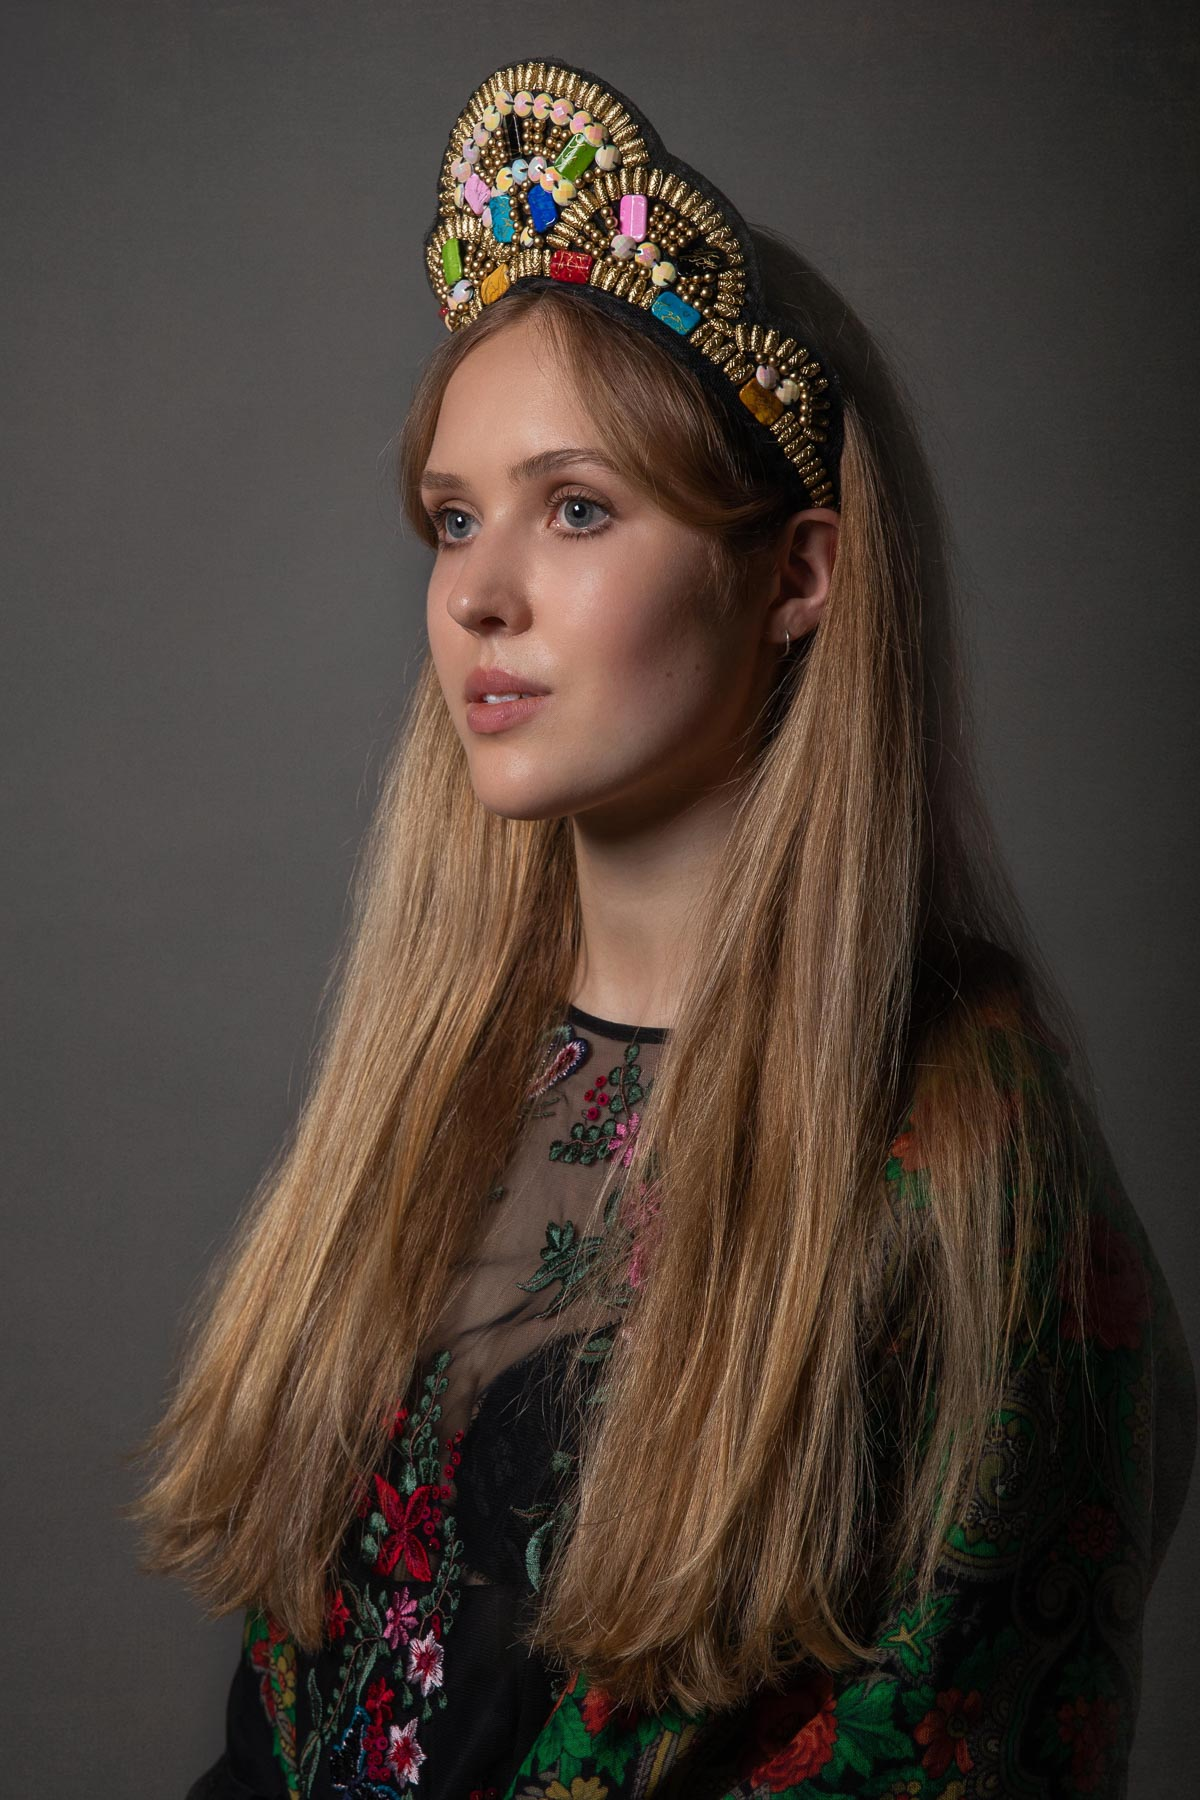 russian-style-fashion-model-Русский-стиль-кокошник-павловопосадский-платок-london-natalia-smith-photography-1.jpeg-0001 2.jpg